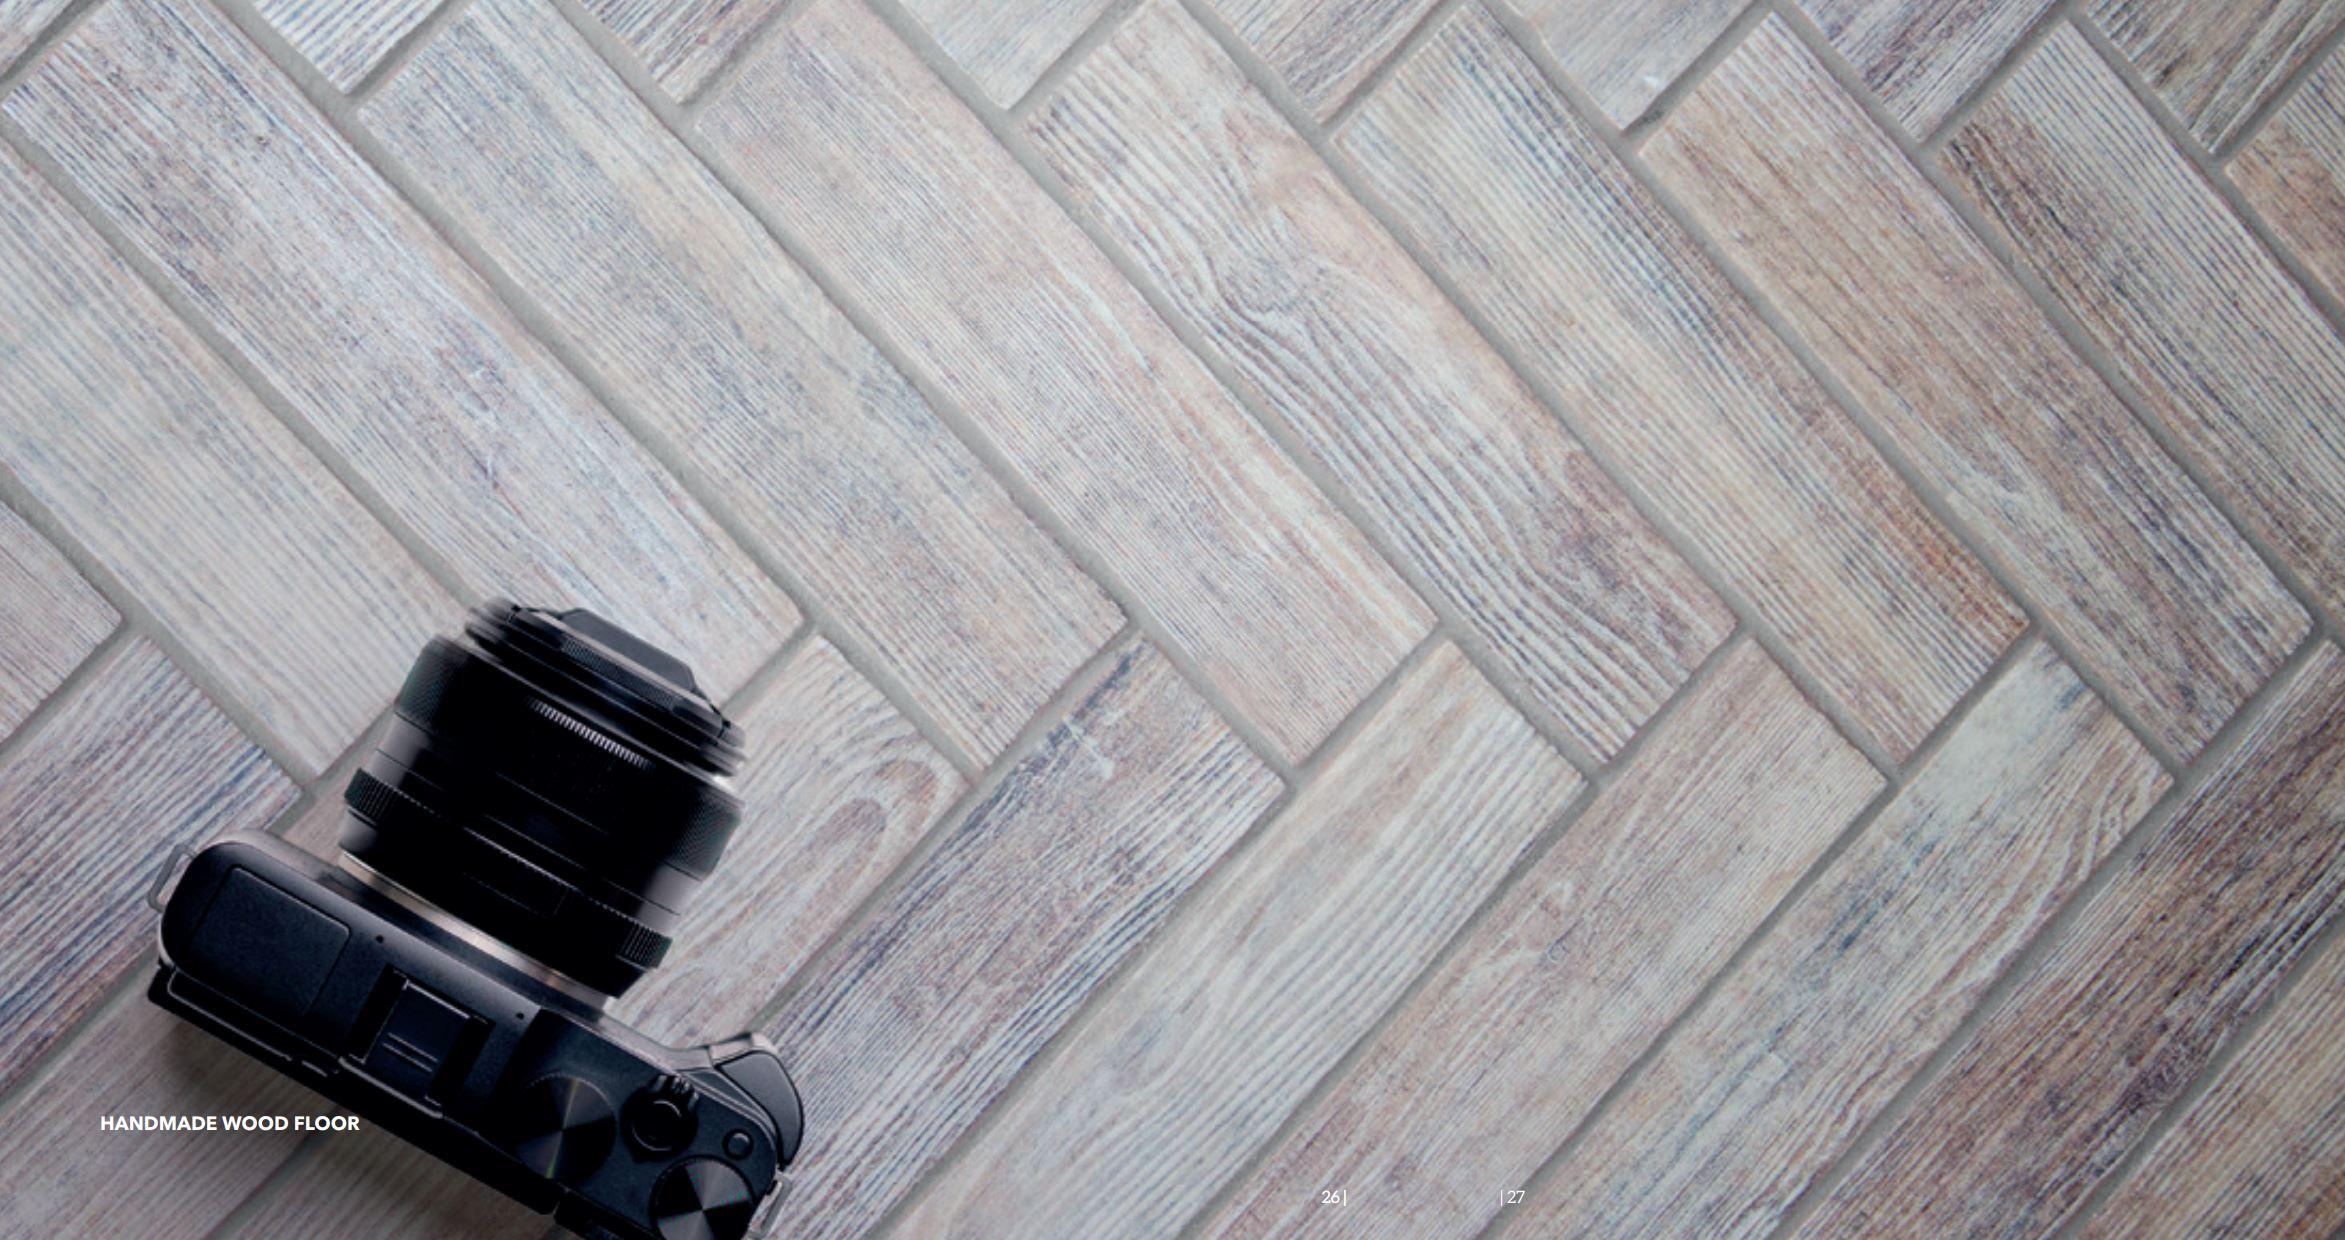 Briques Handmade Wood Floor